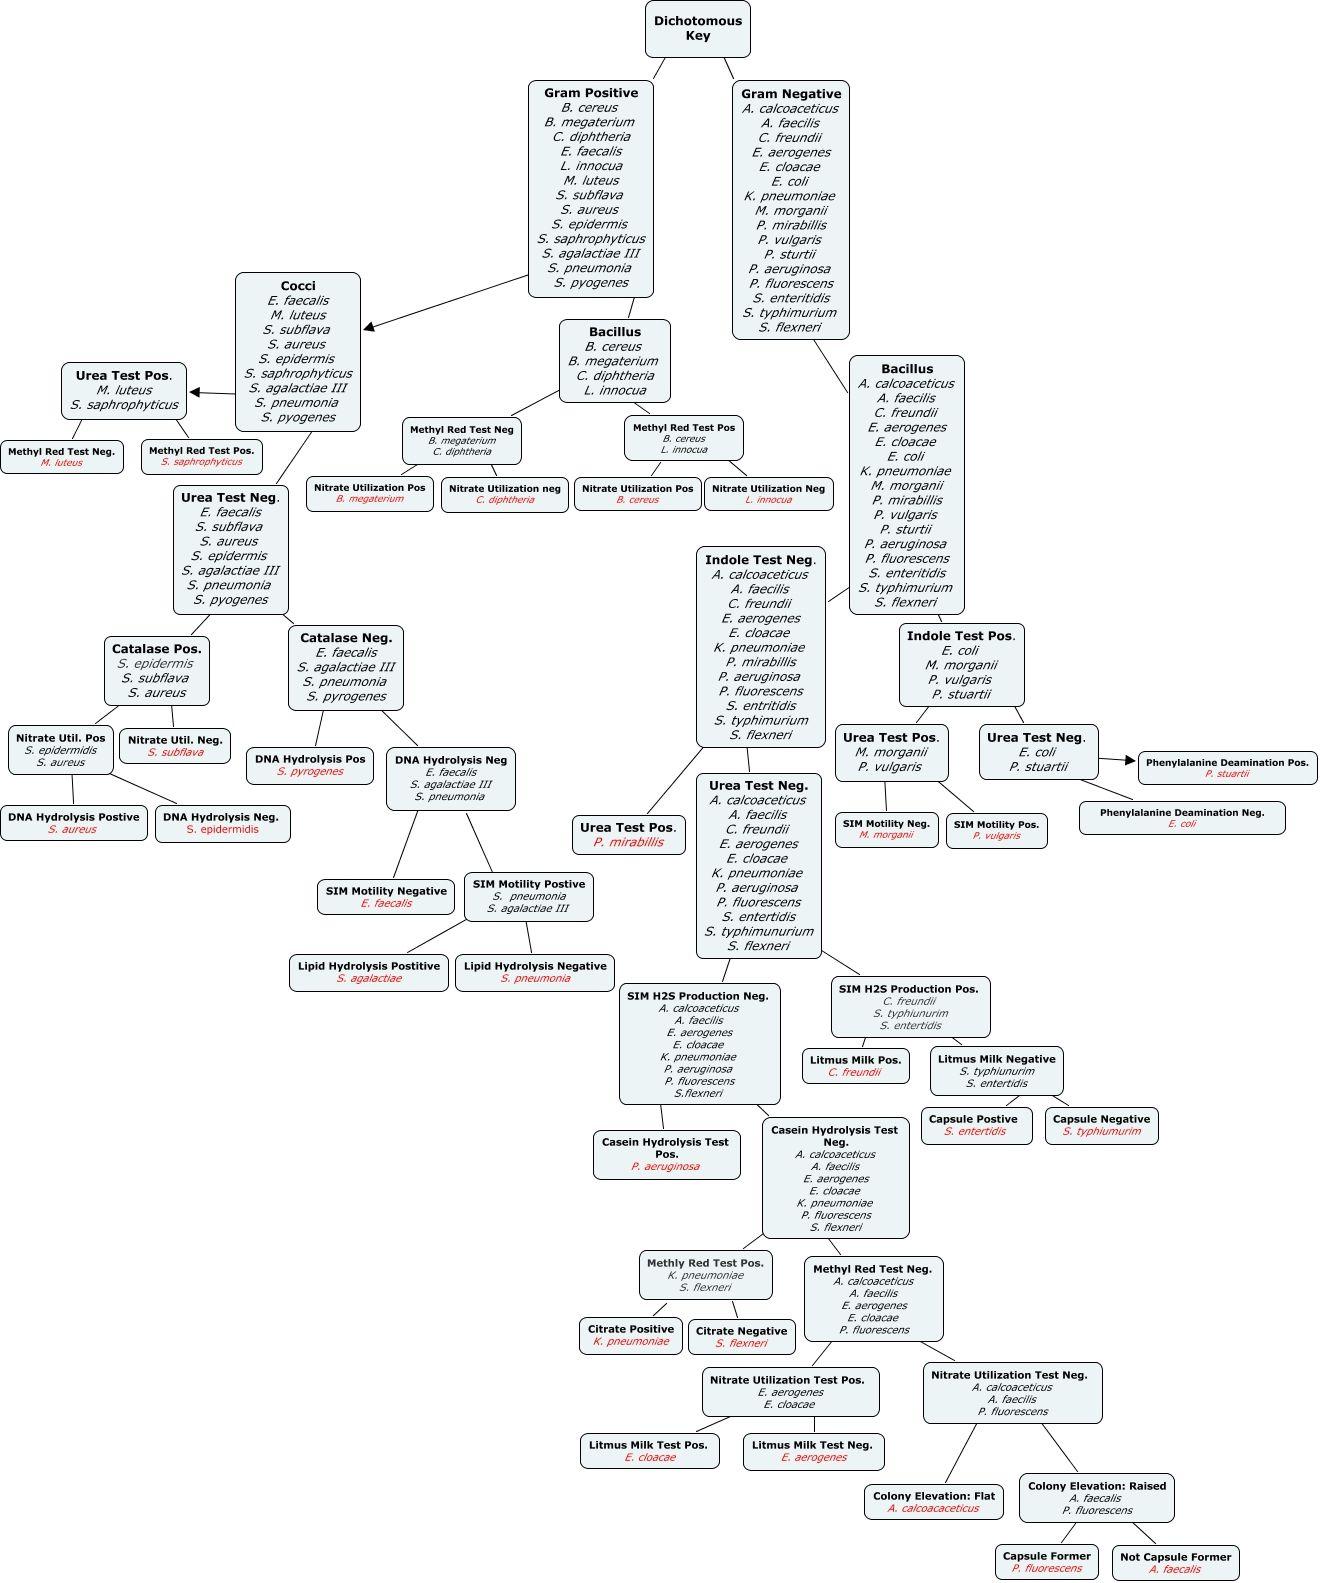 Dichotomous Key Jgoo Dichotomous Key Microbiology Lab Microbiology Study